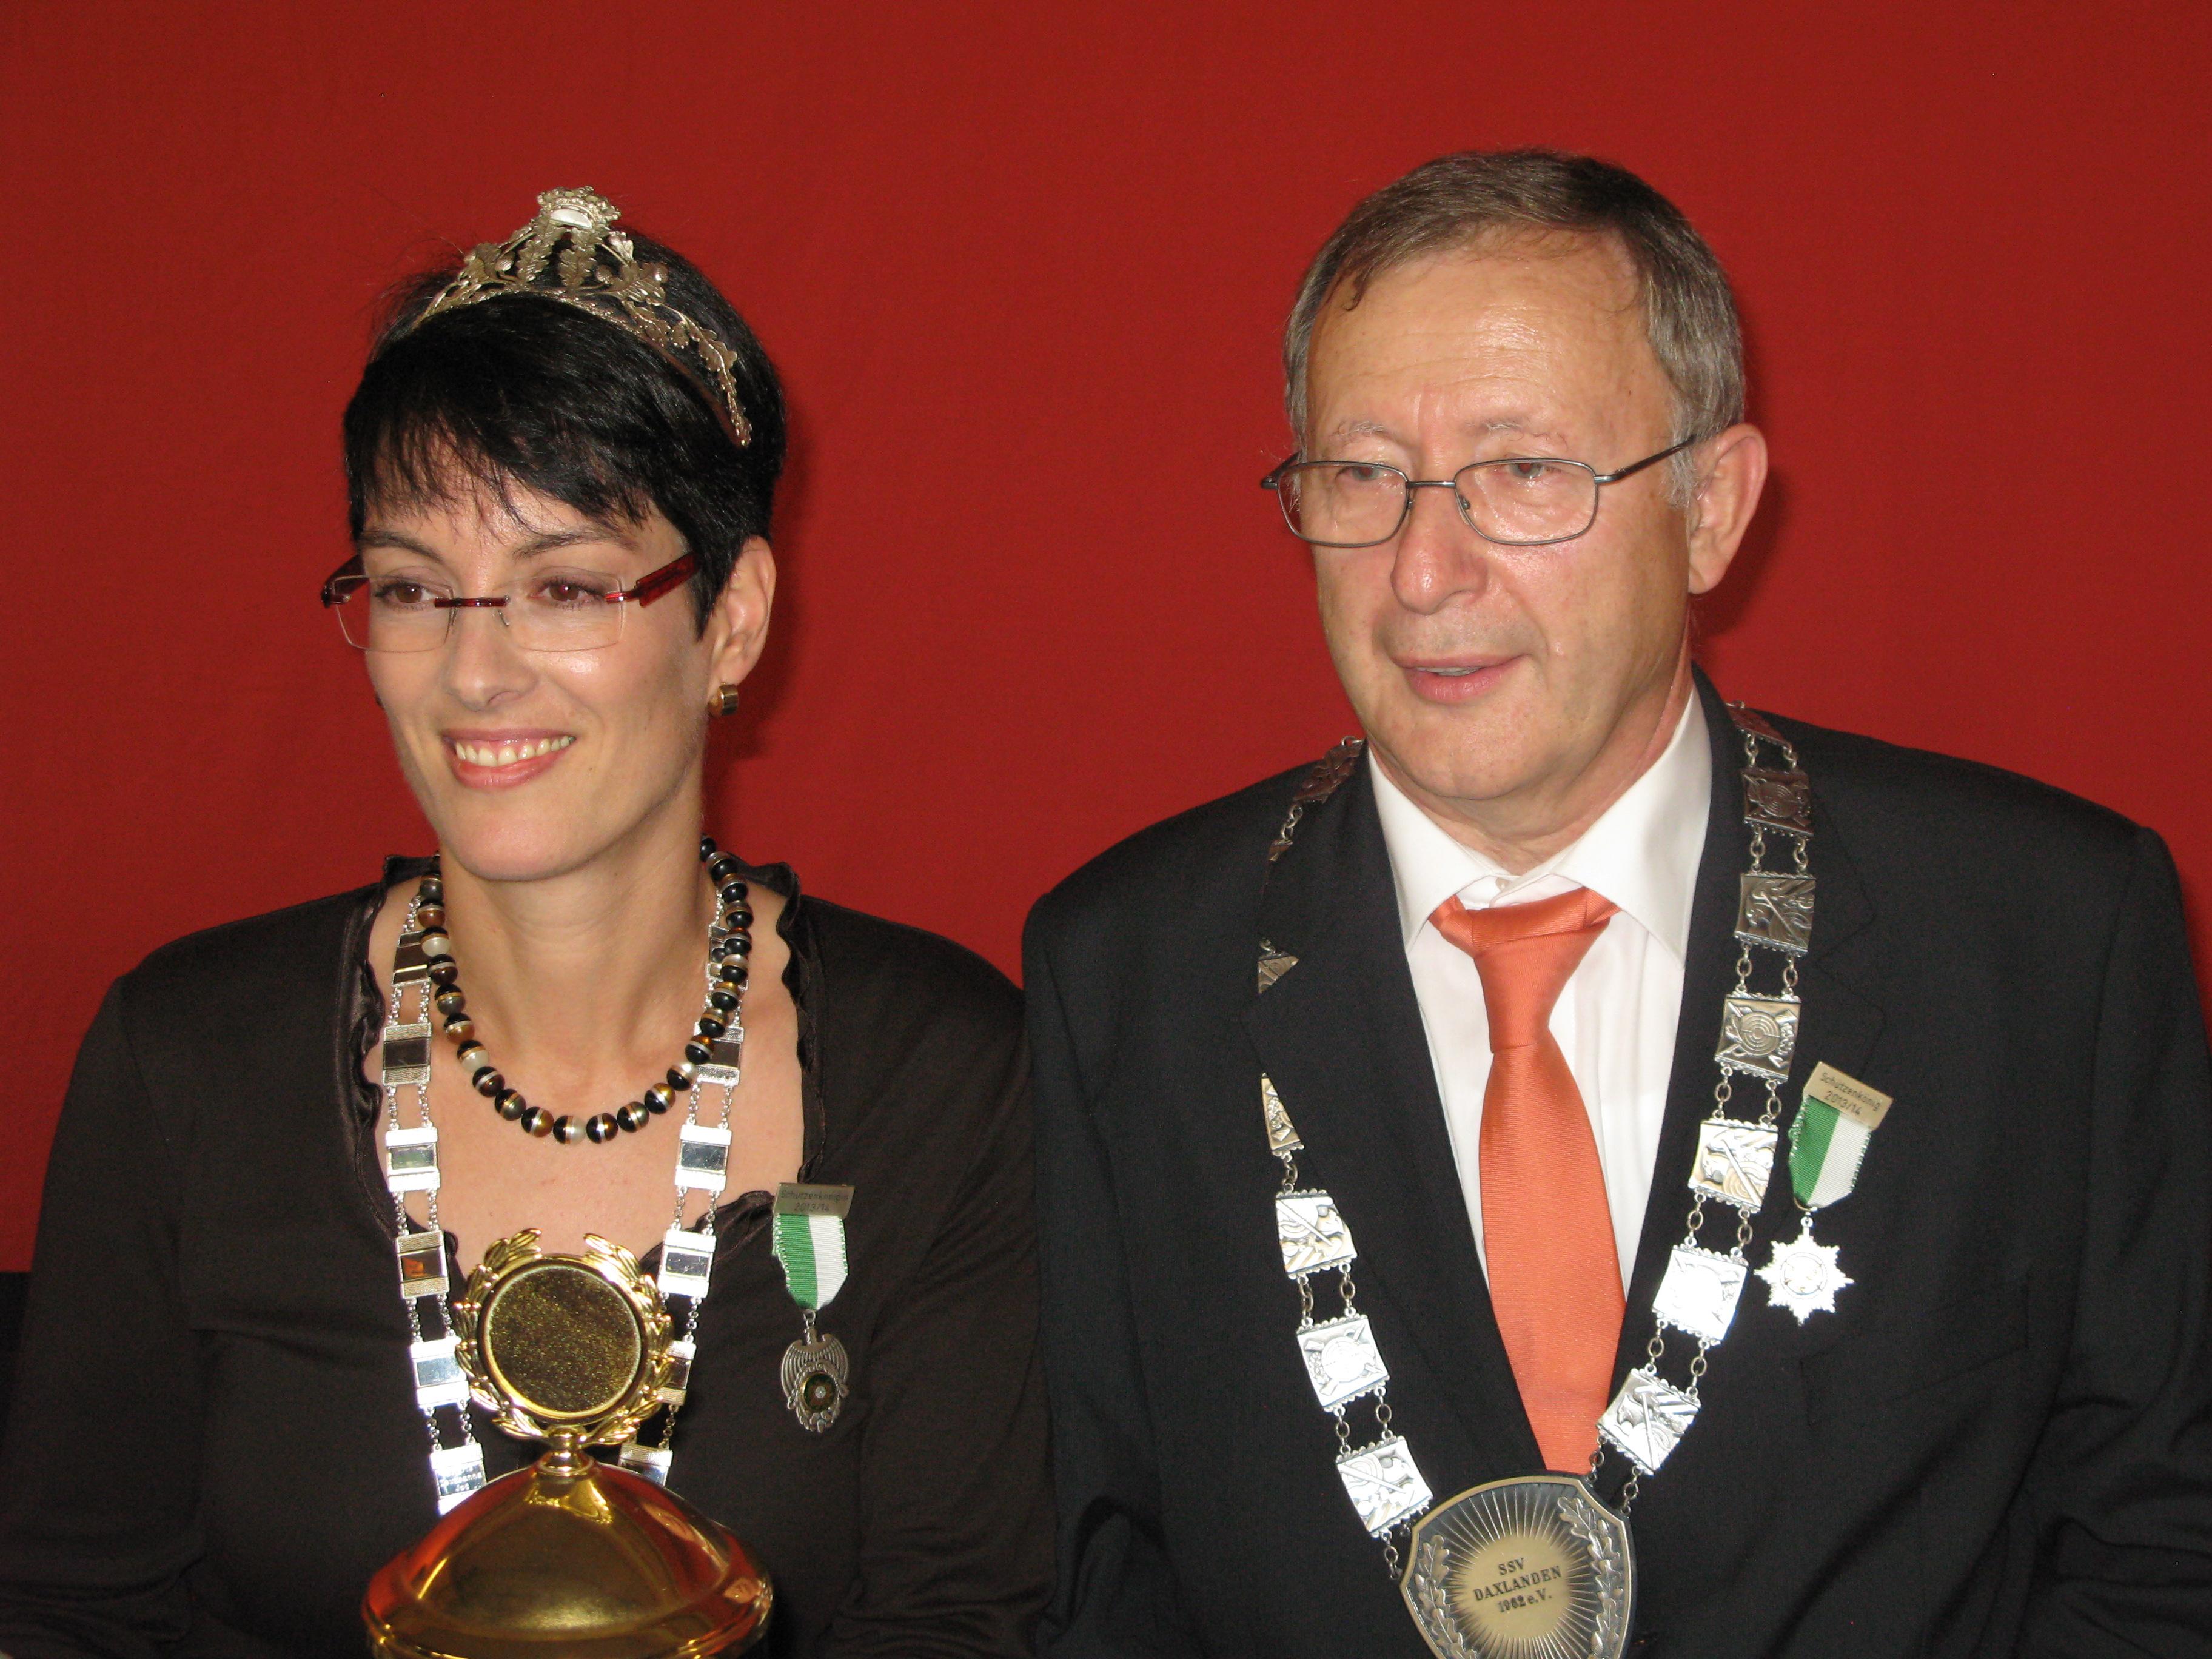 Königsball2013 064